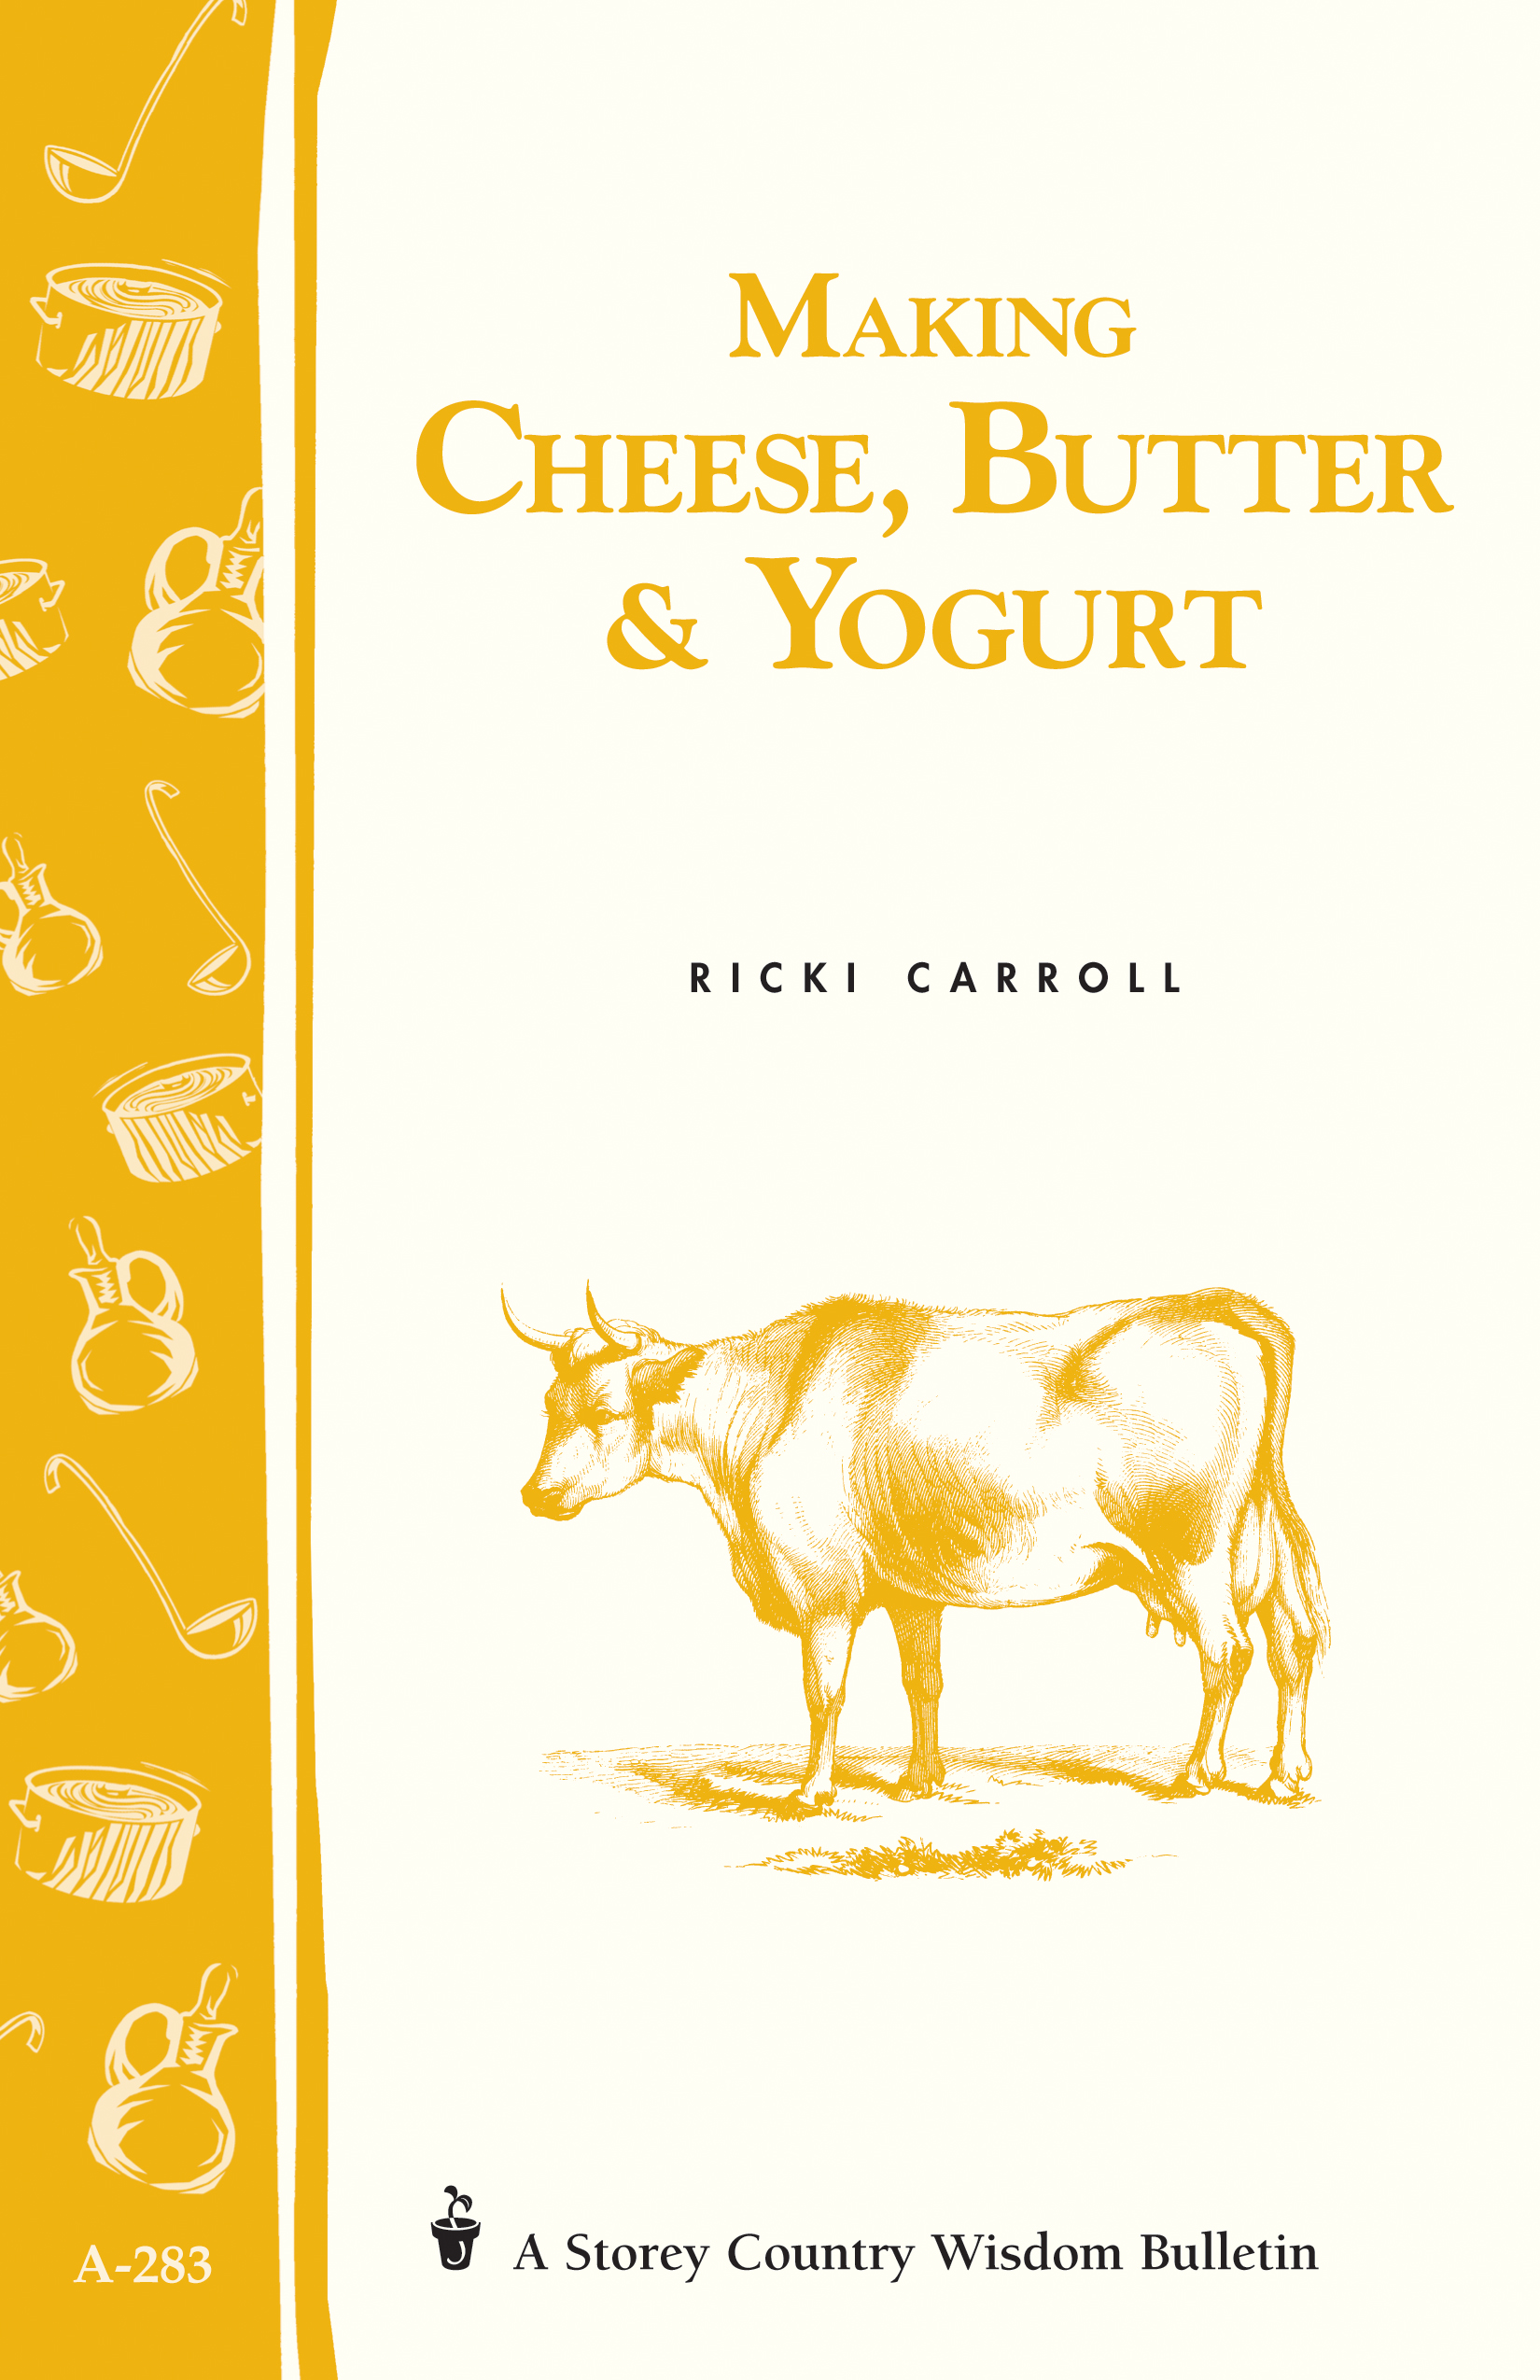 Making Cheese, Butter & Yogurt (Storey's Country Wisdom Bulletin A-283) - Ricki Carroll